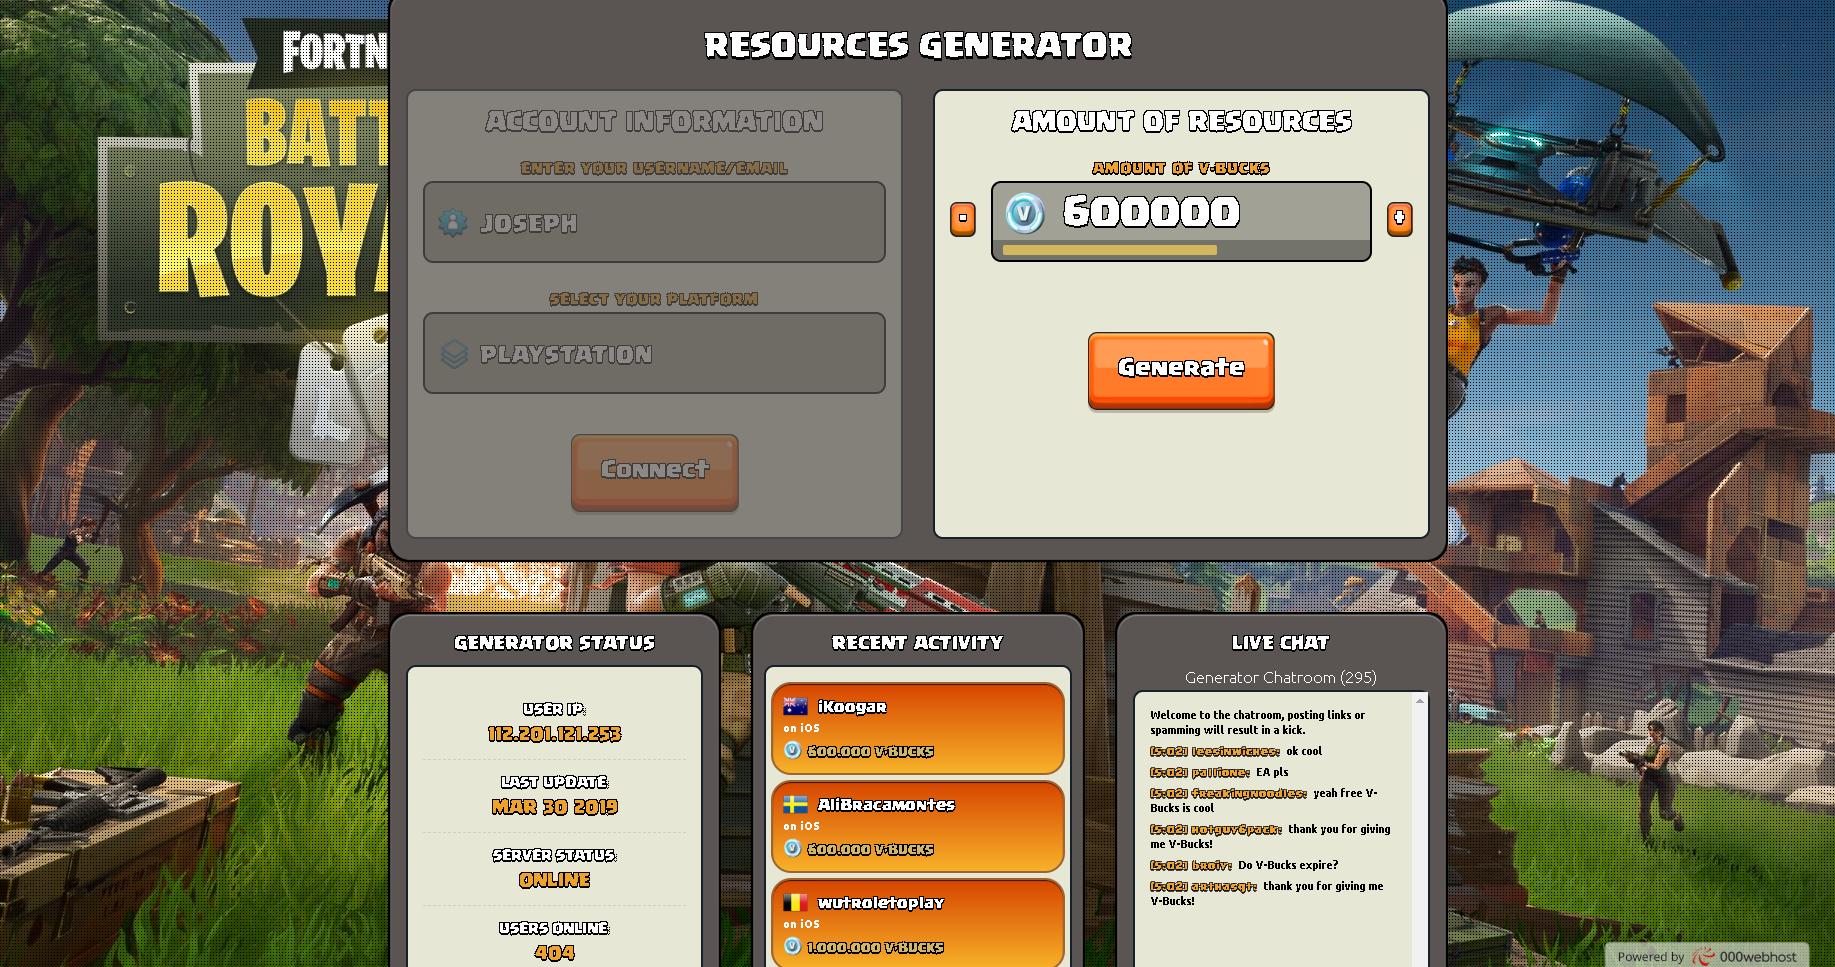 Fortnite Free V Bucks Generator Hack Fortnite Battle Royale Hack